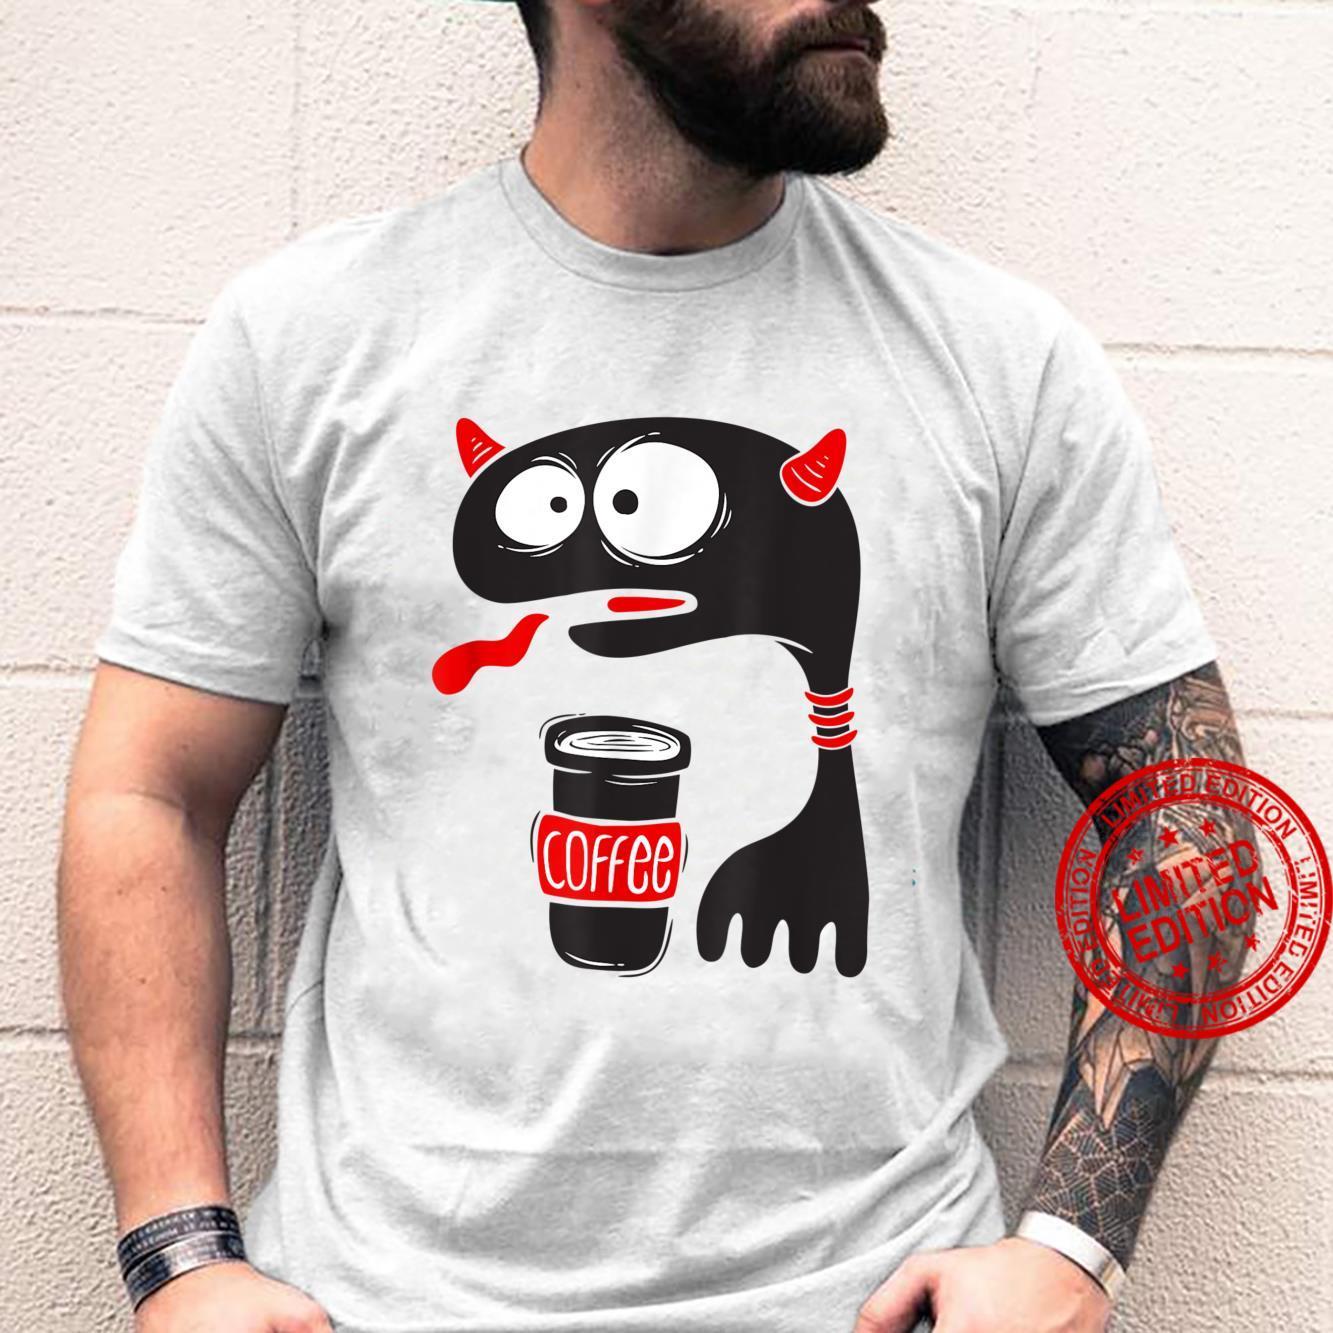 Coffee Thirsty Grumpy Daemon Tiny Legs Sarcasm Shirt